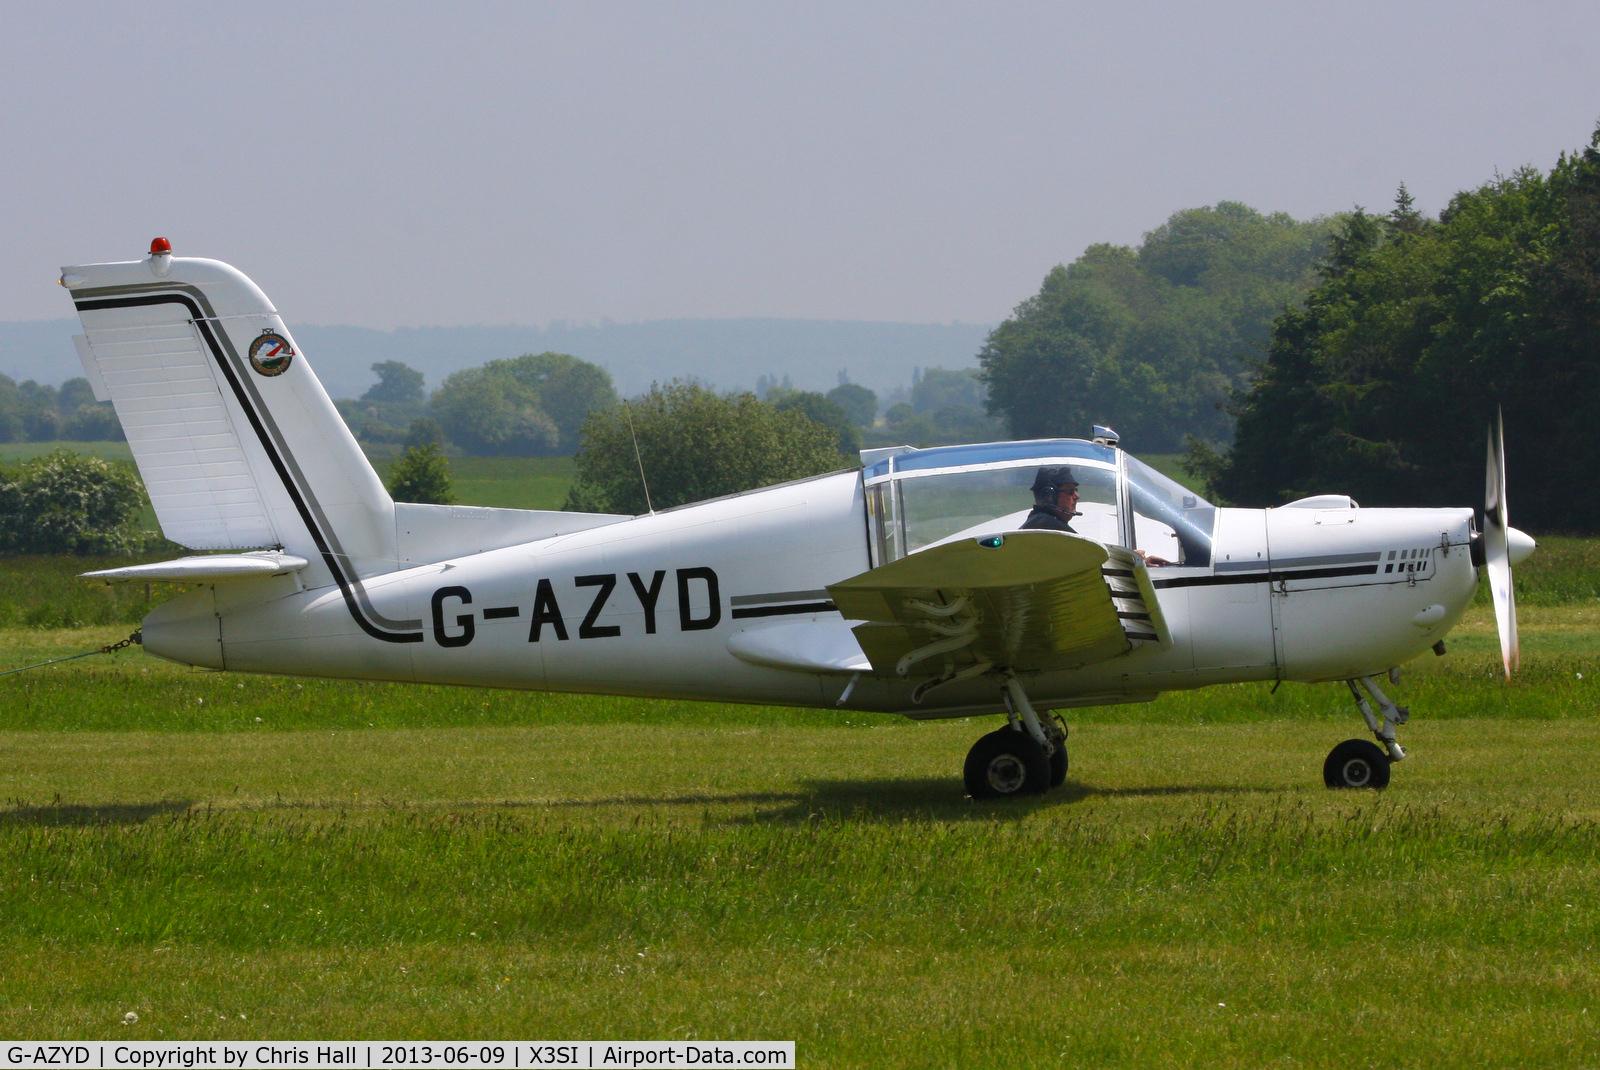 G-AZYD, 1966 Socata MS-893A Rallye Commodore 180 C/N 10645, Staffordshire Gliding Club, Seighford Airfield